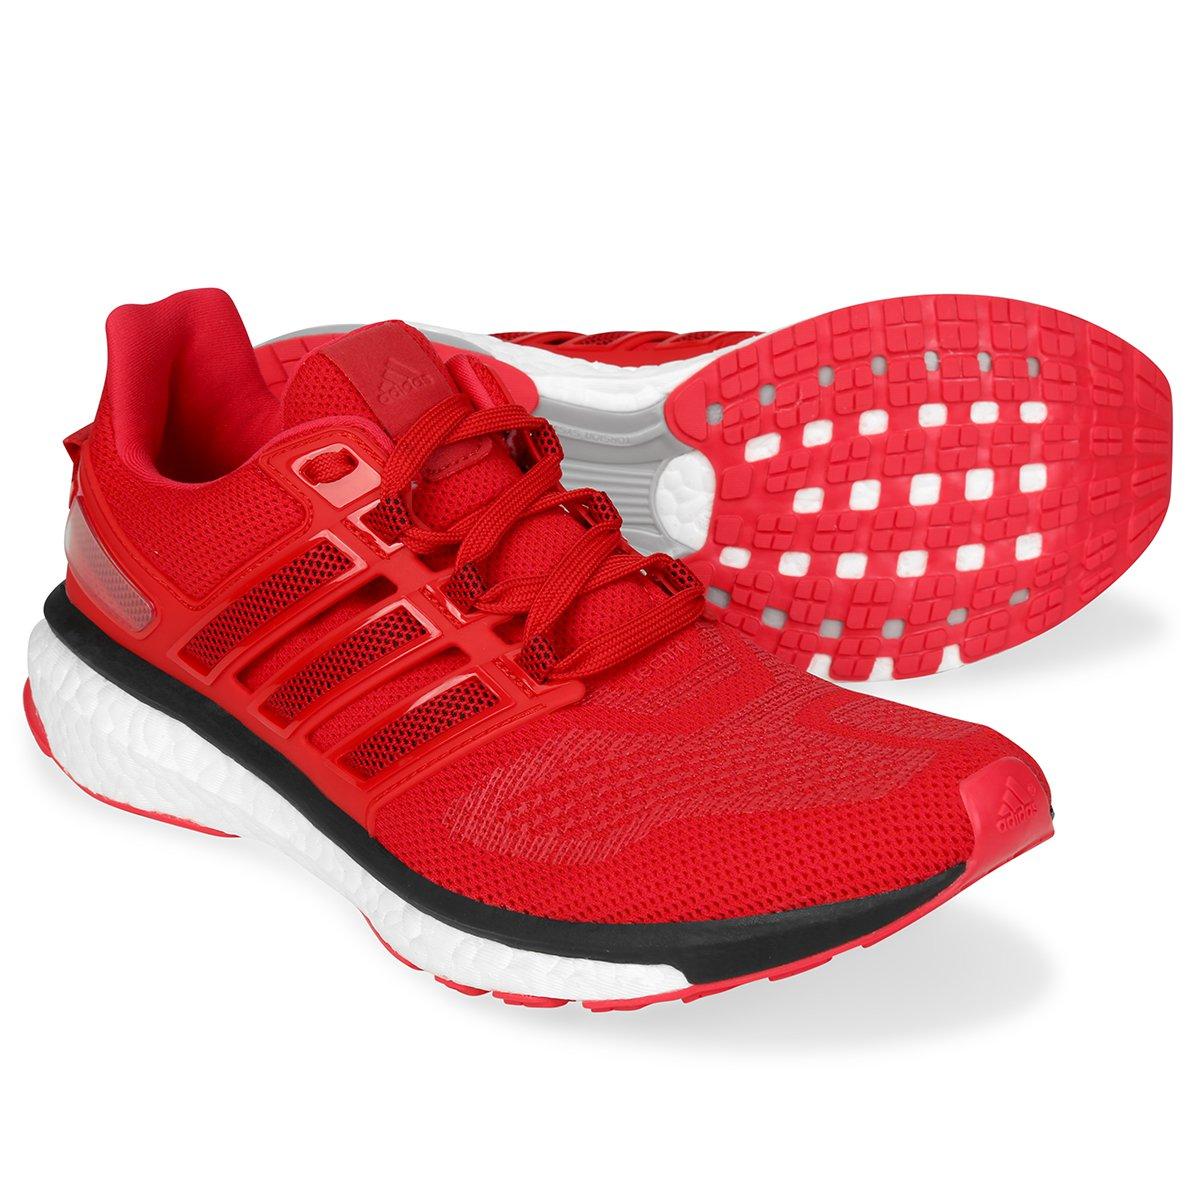 Tênis Adidas Energy Boost 3 Masculino - Compre Agora  f114ac1c77adc